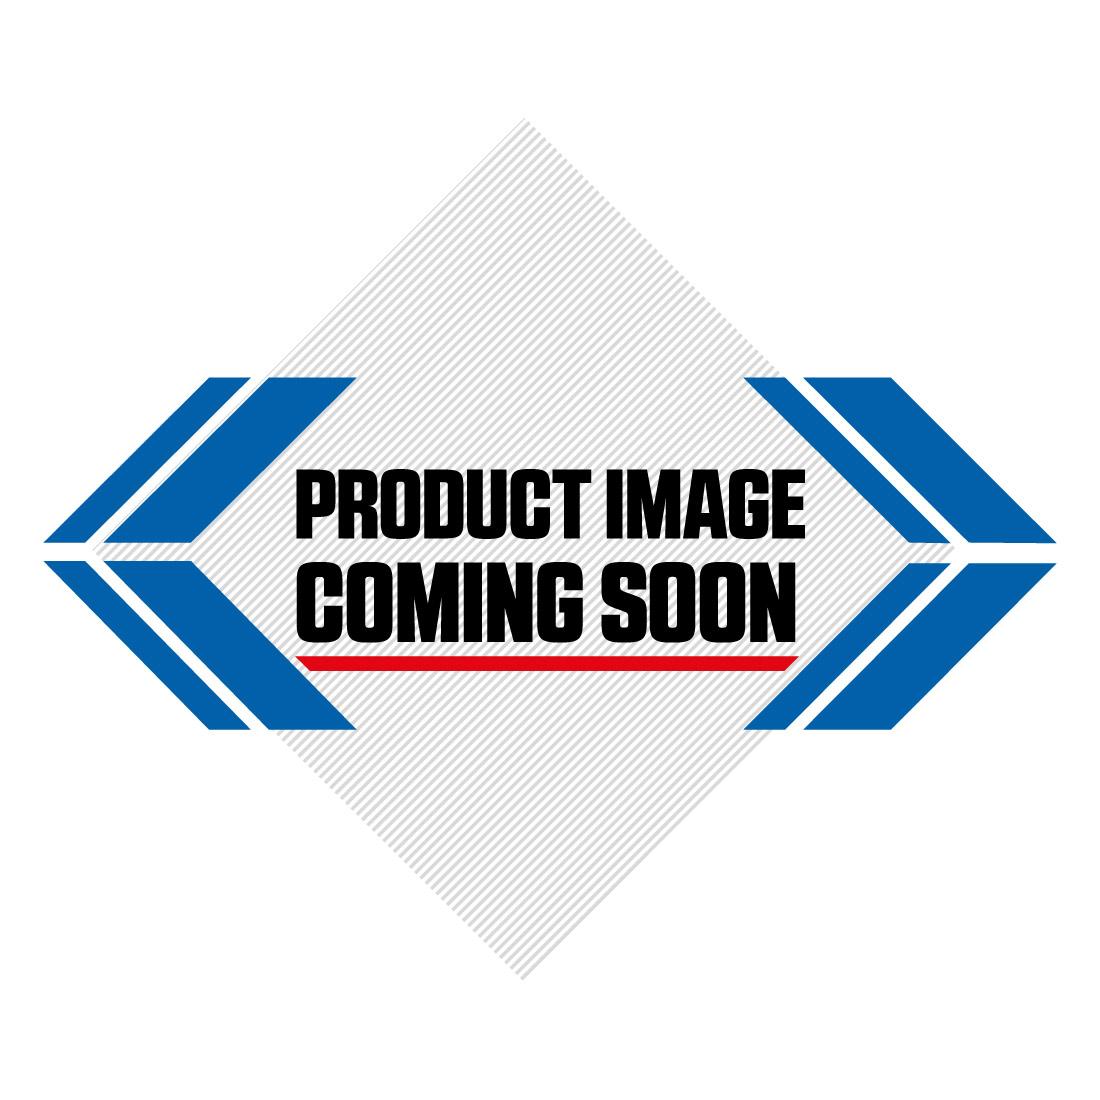 2019 UFO Interceptor 2 Helmet - Galaxy Limited Edition Image-0